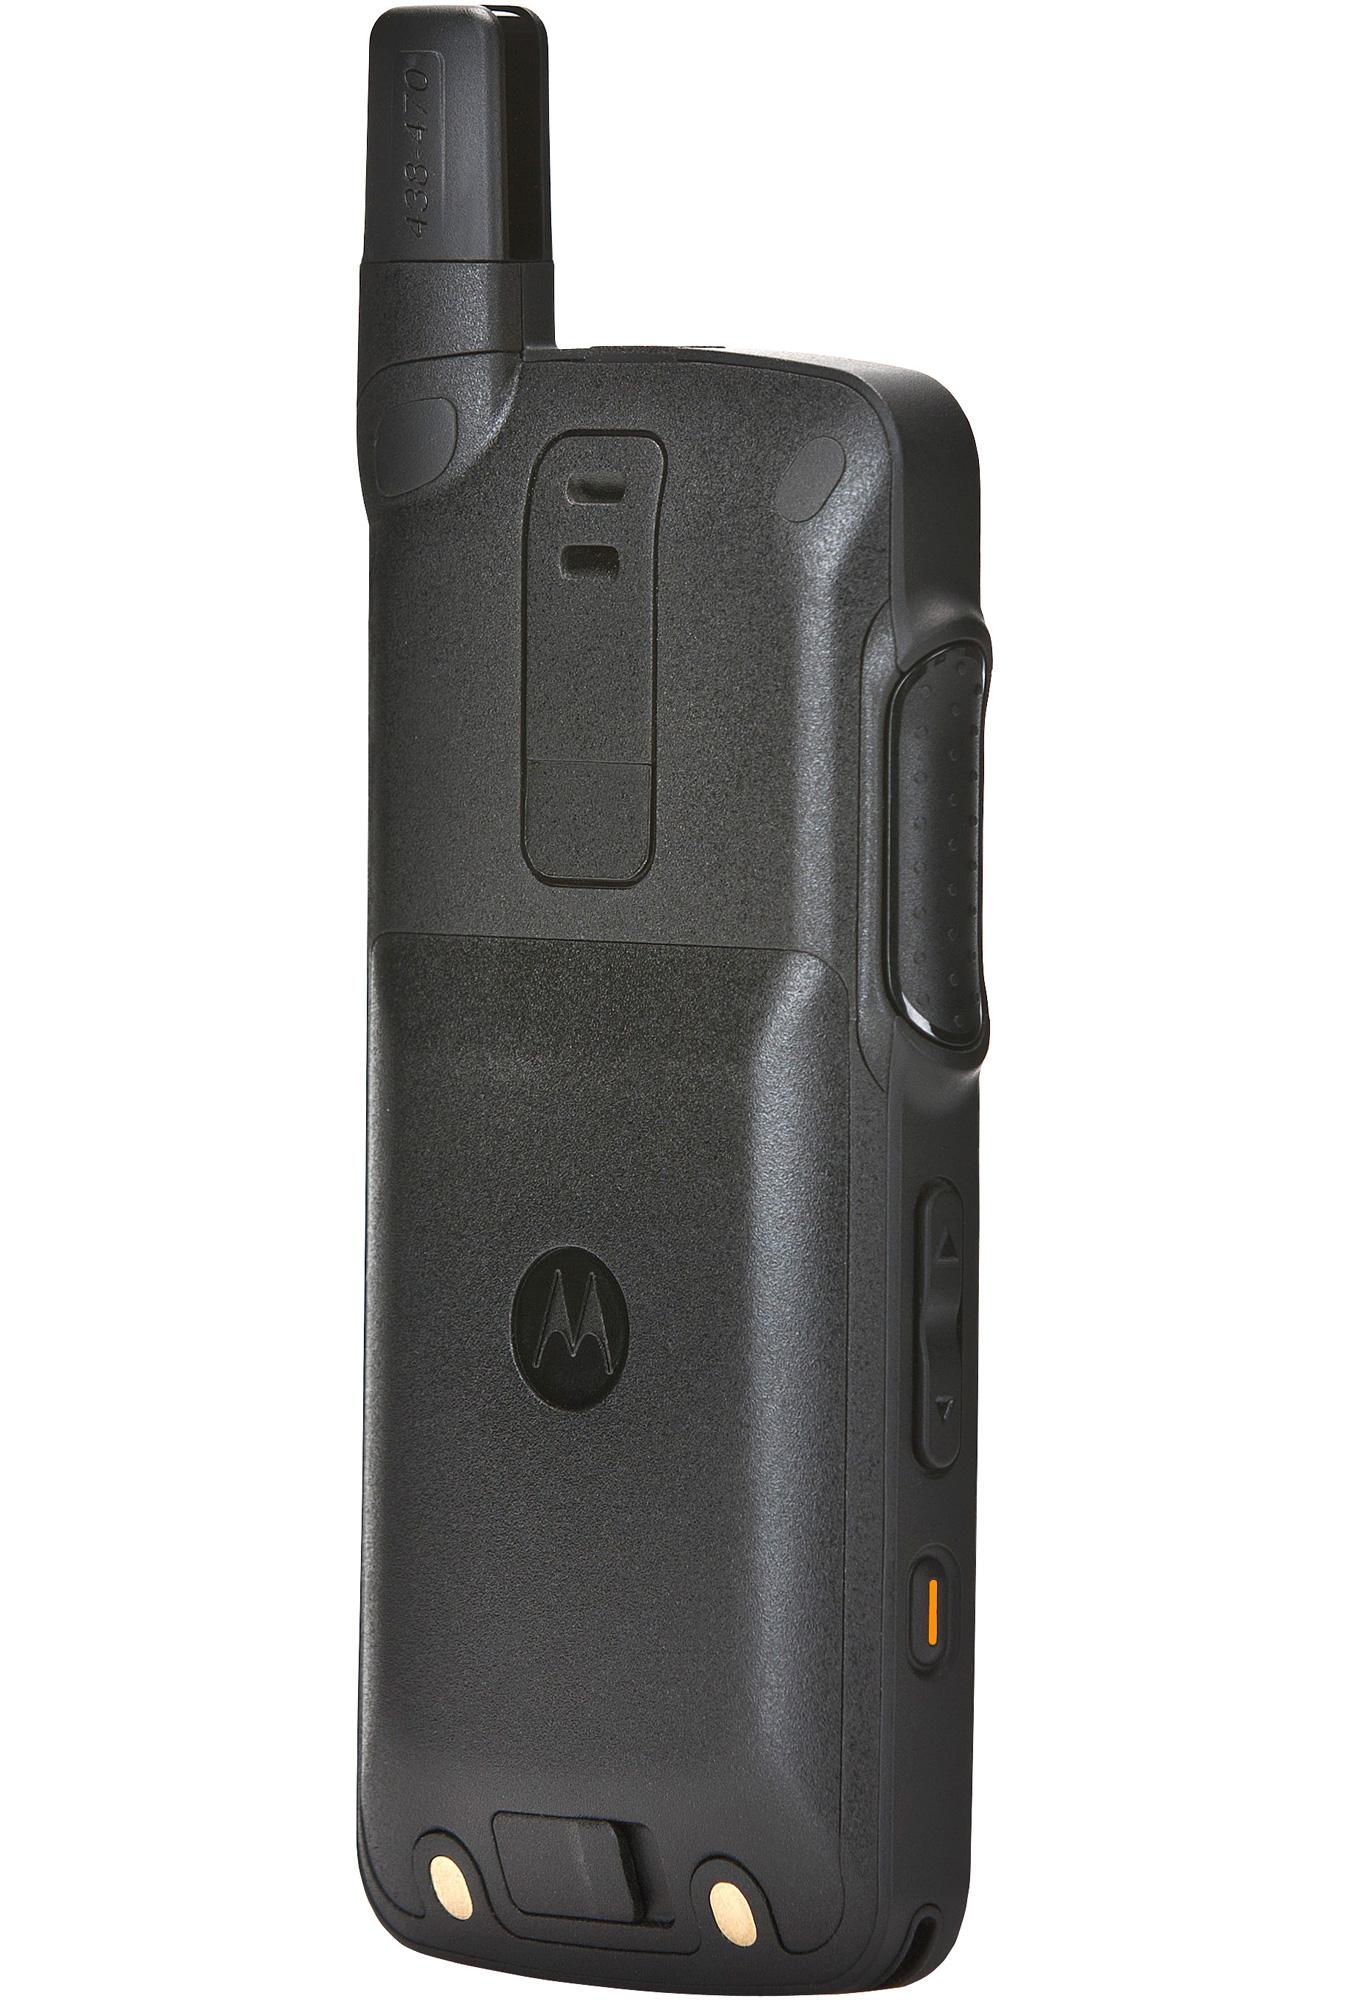 Motorola SL4000 / SL4010 | Apex Radio Systems